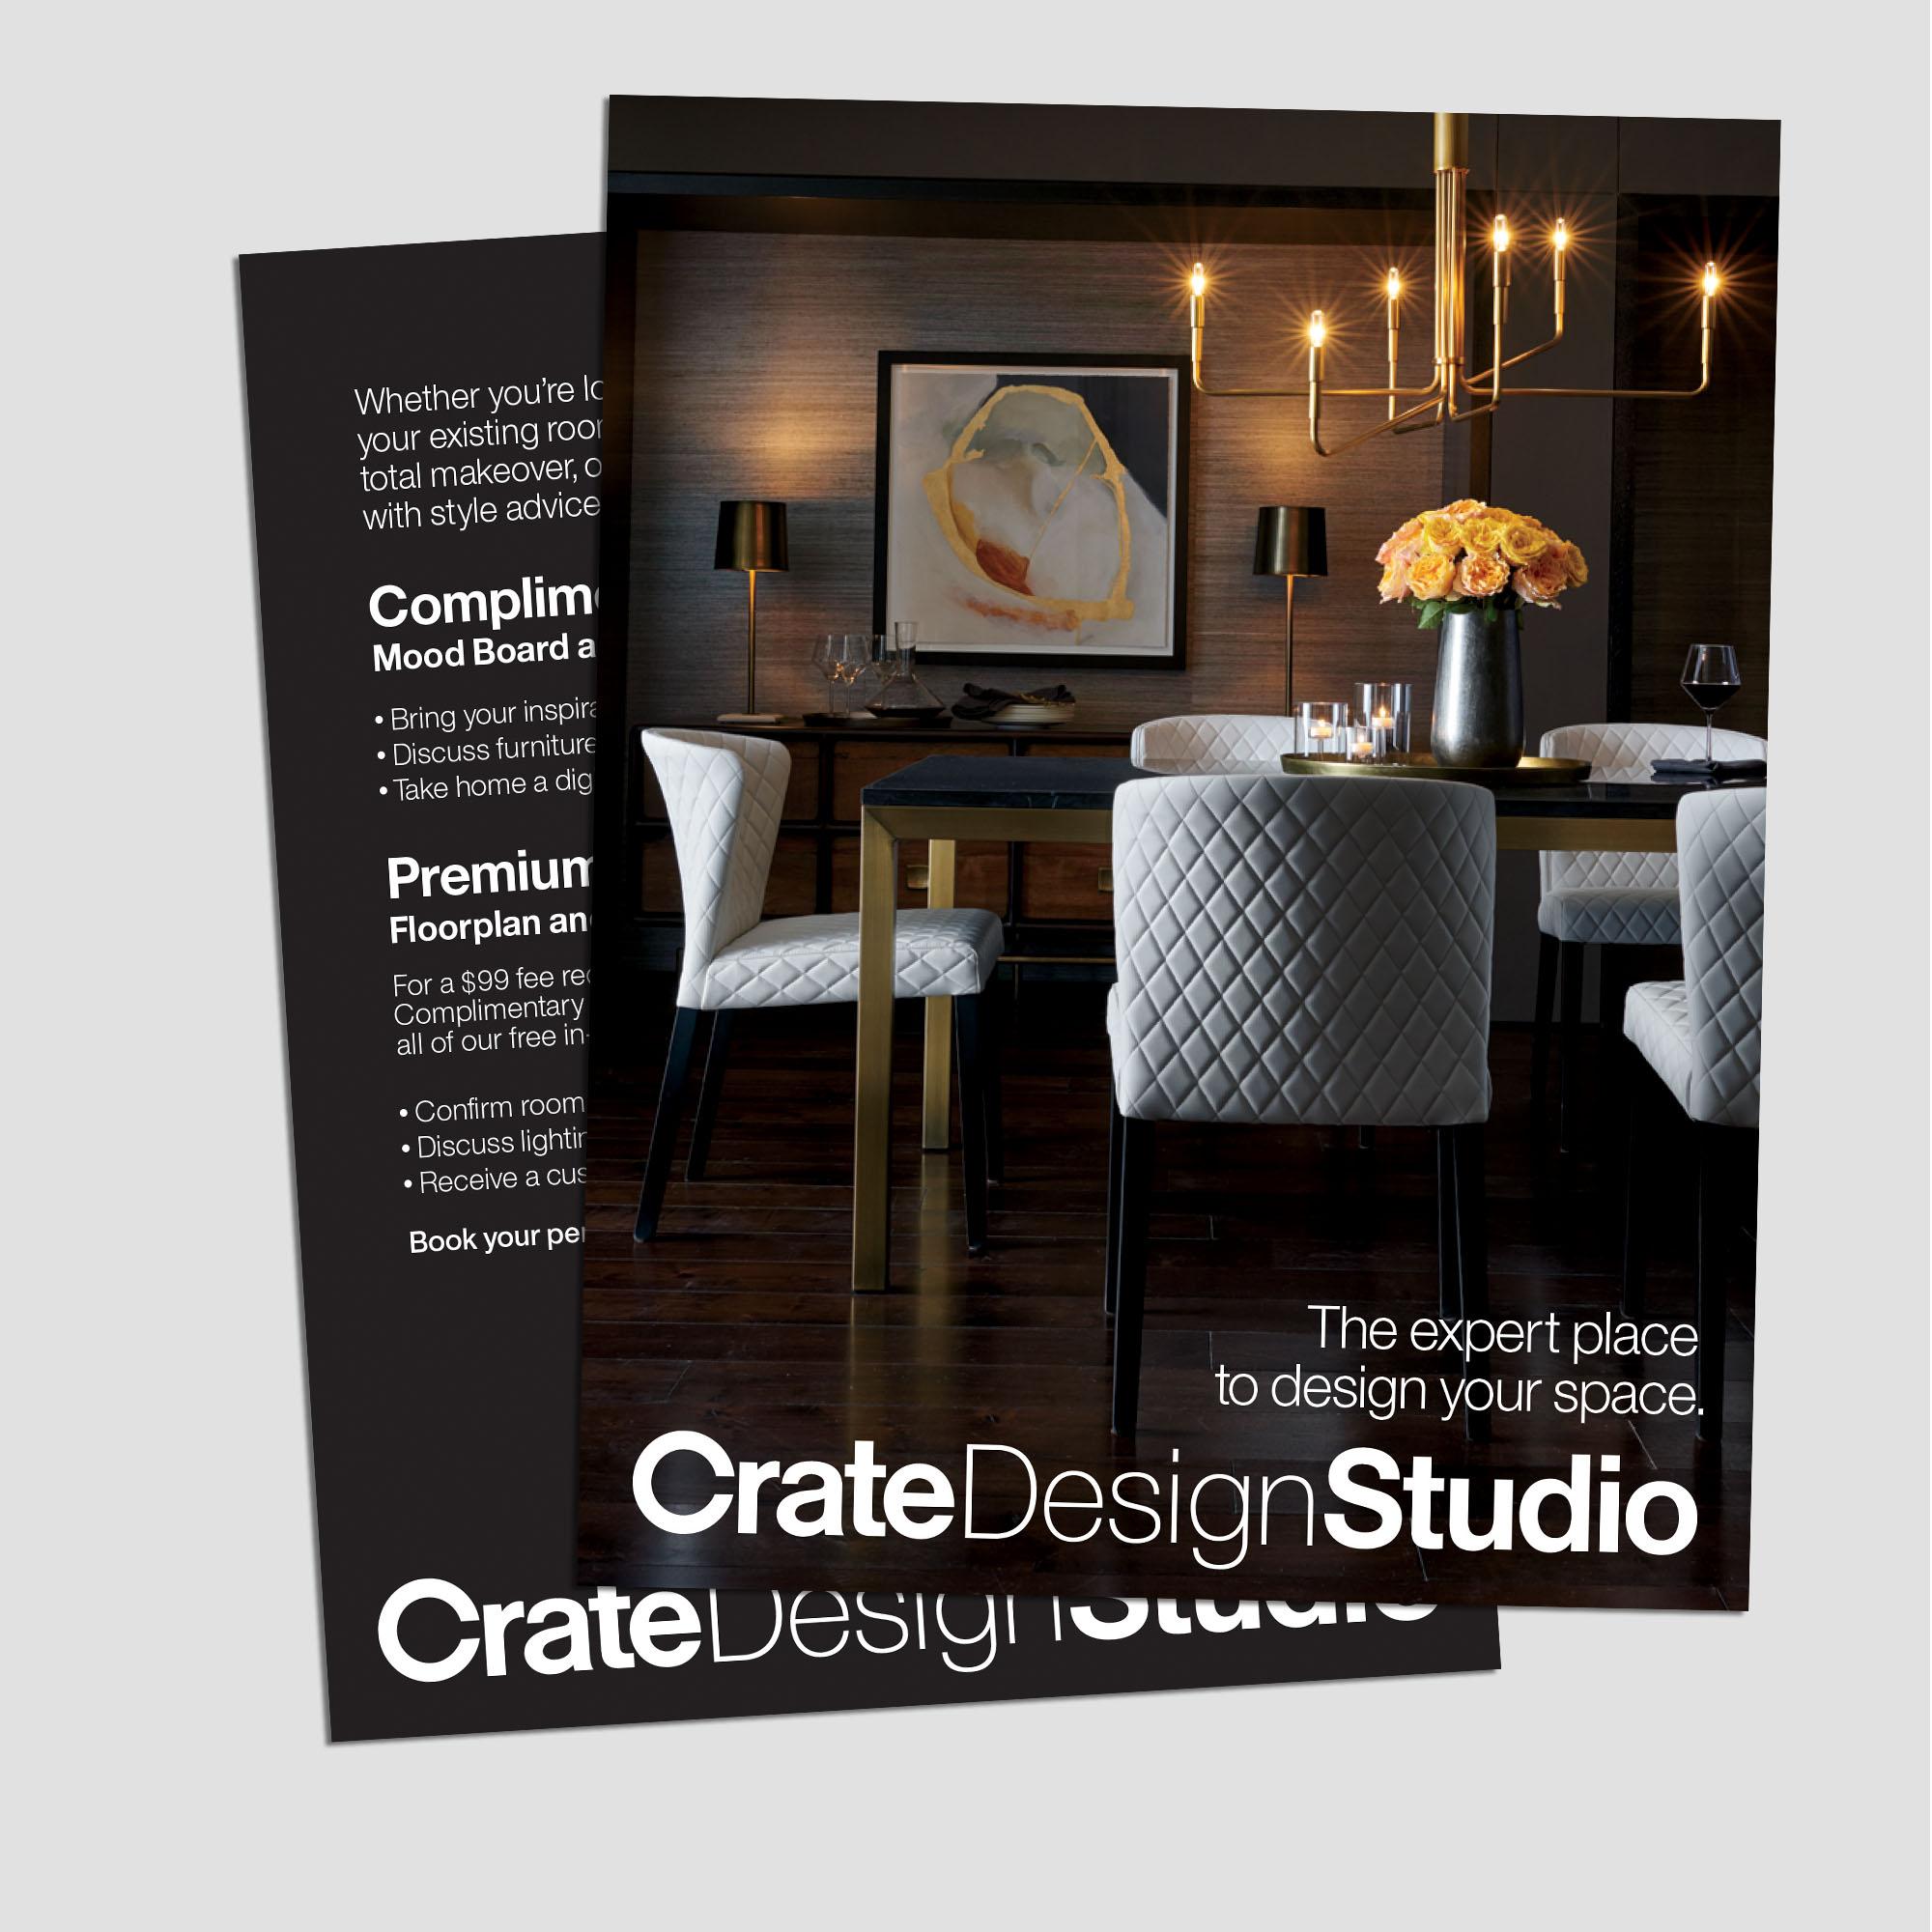 CRATE DESIGN STUDIO TAKEAWAY CARD // 2017